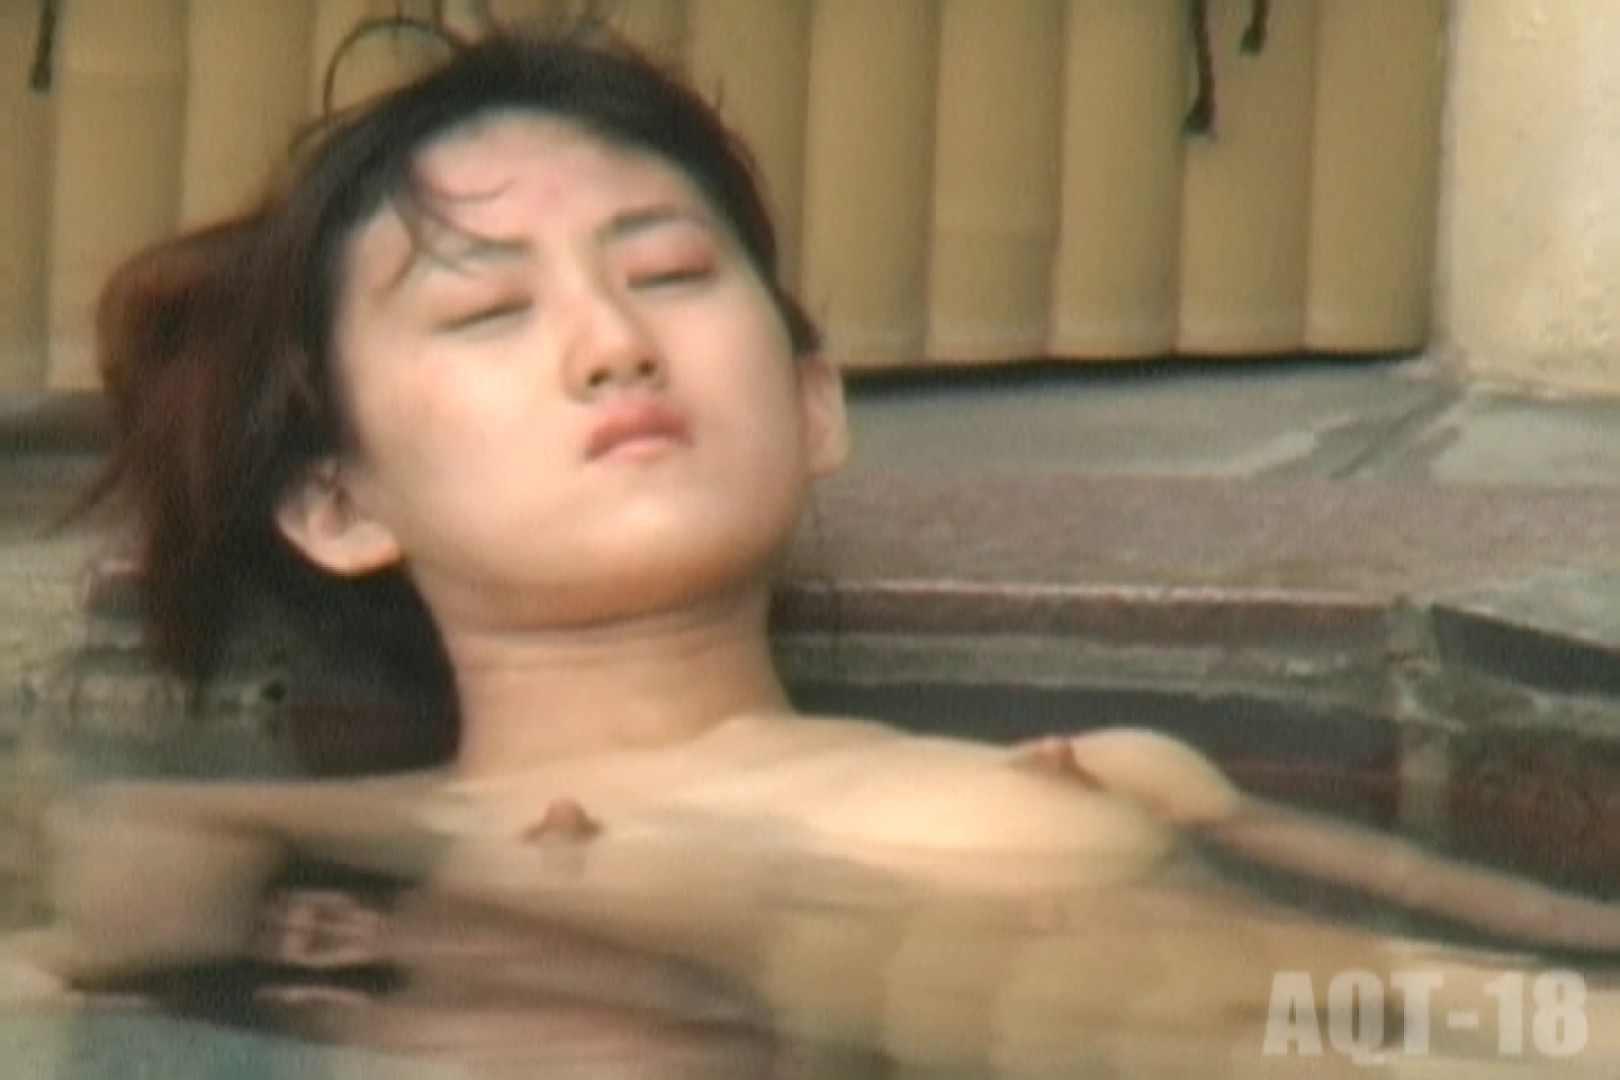 Aquaな露天風呂Vol.862 盗撮 AV無料動画キャプチャ 92PICs 65